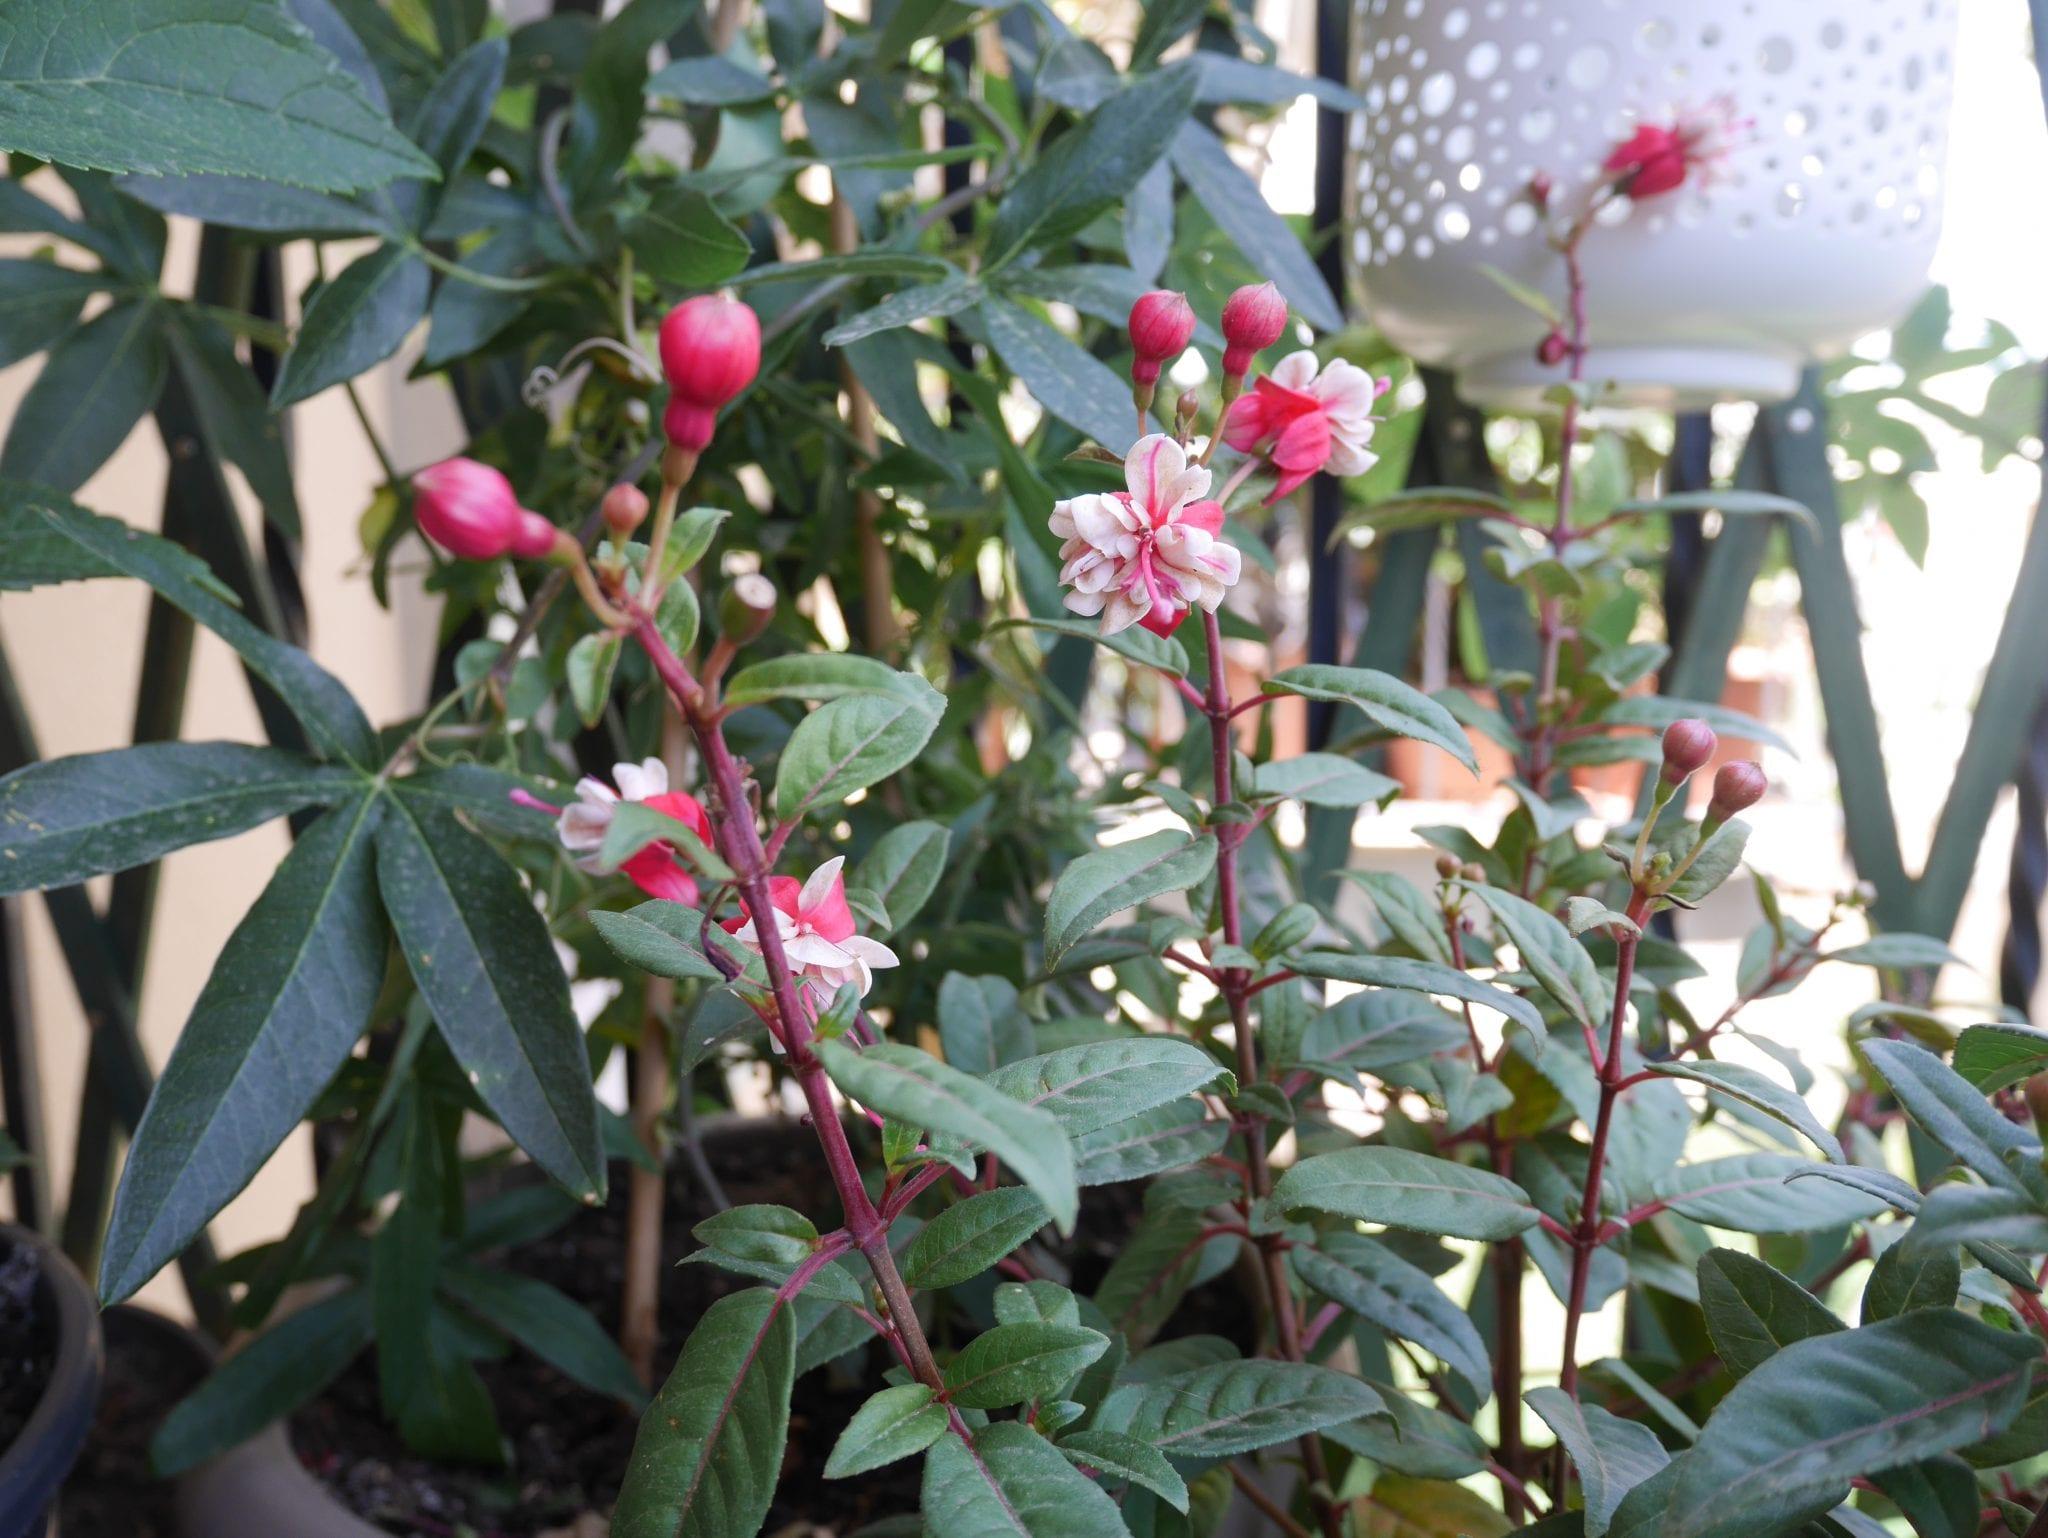 fuchsia fiore - Balcone - LePlume